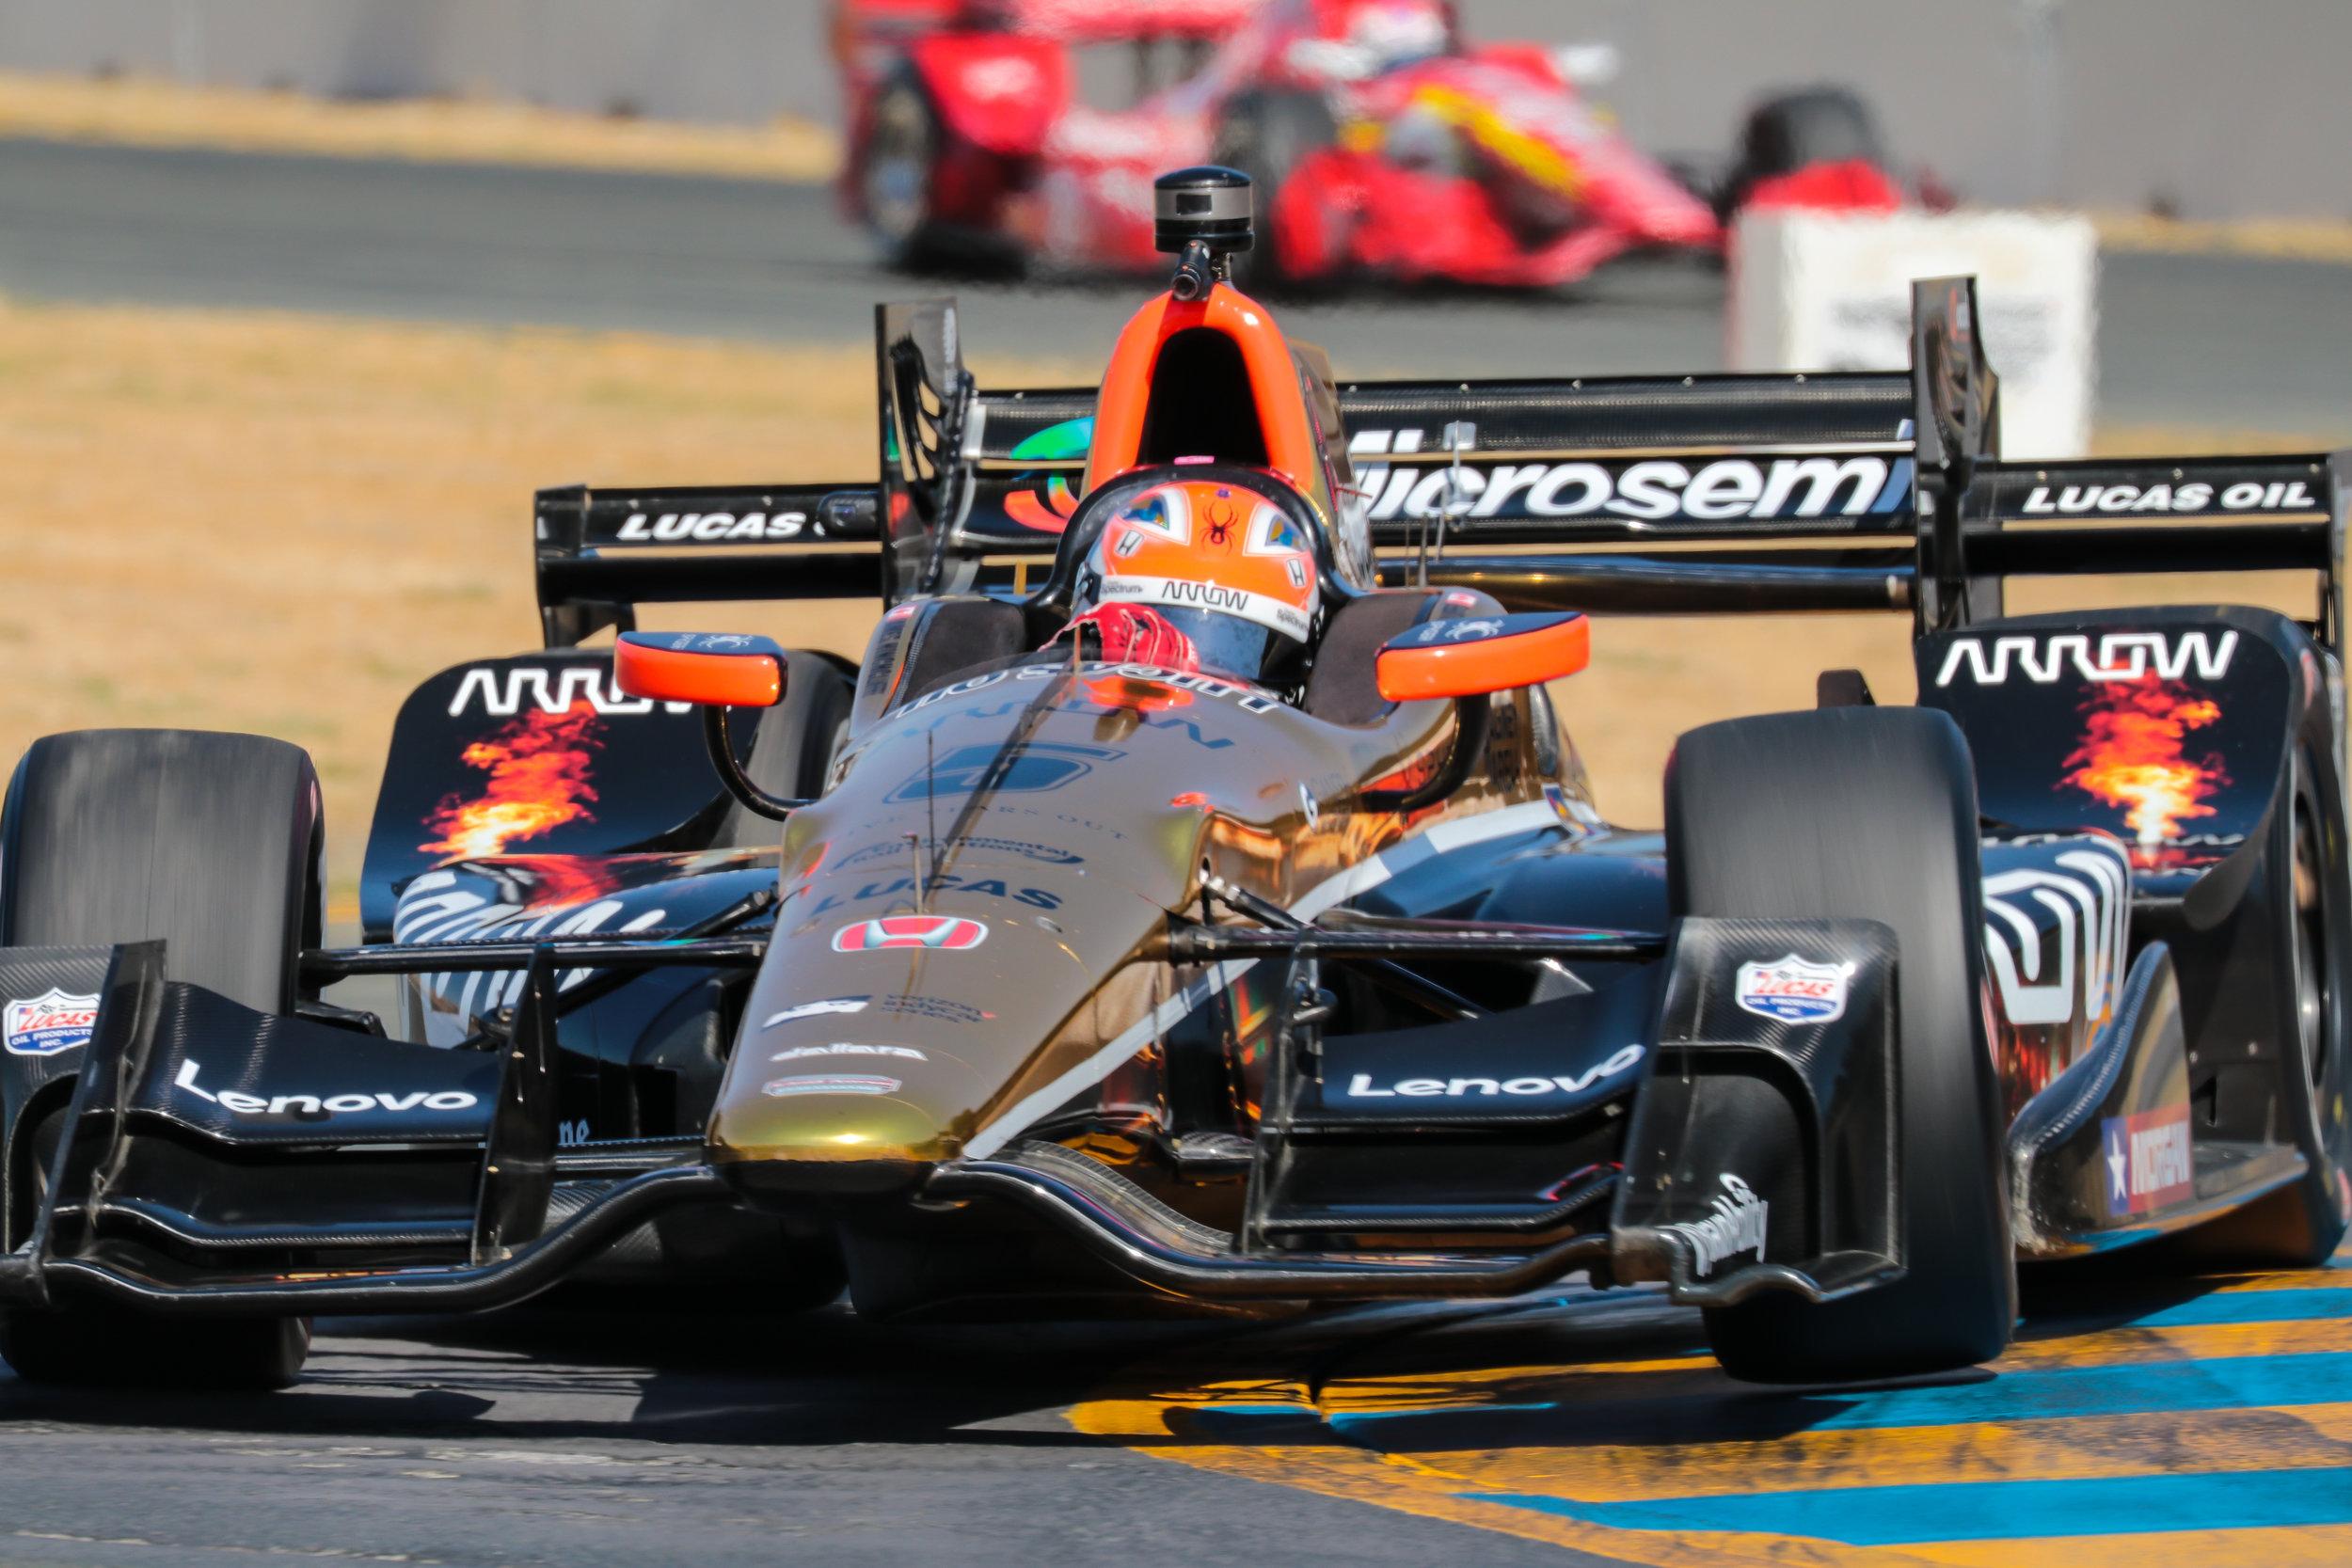 Indy16-2079.jpg